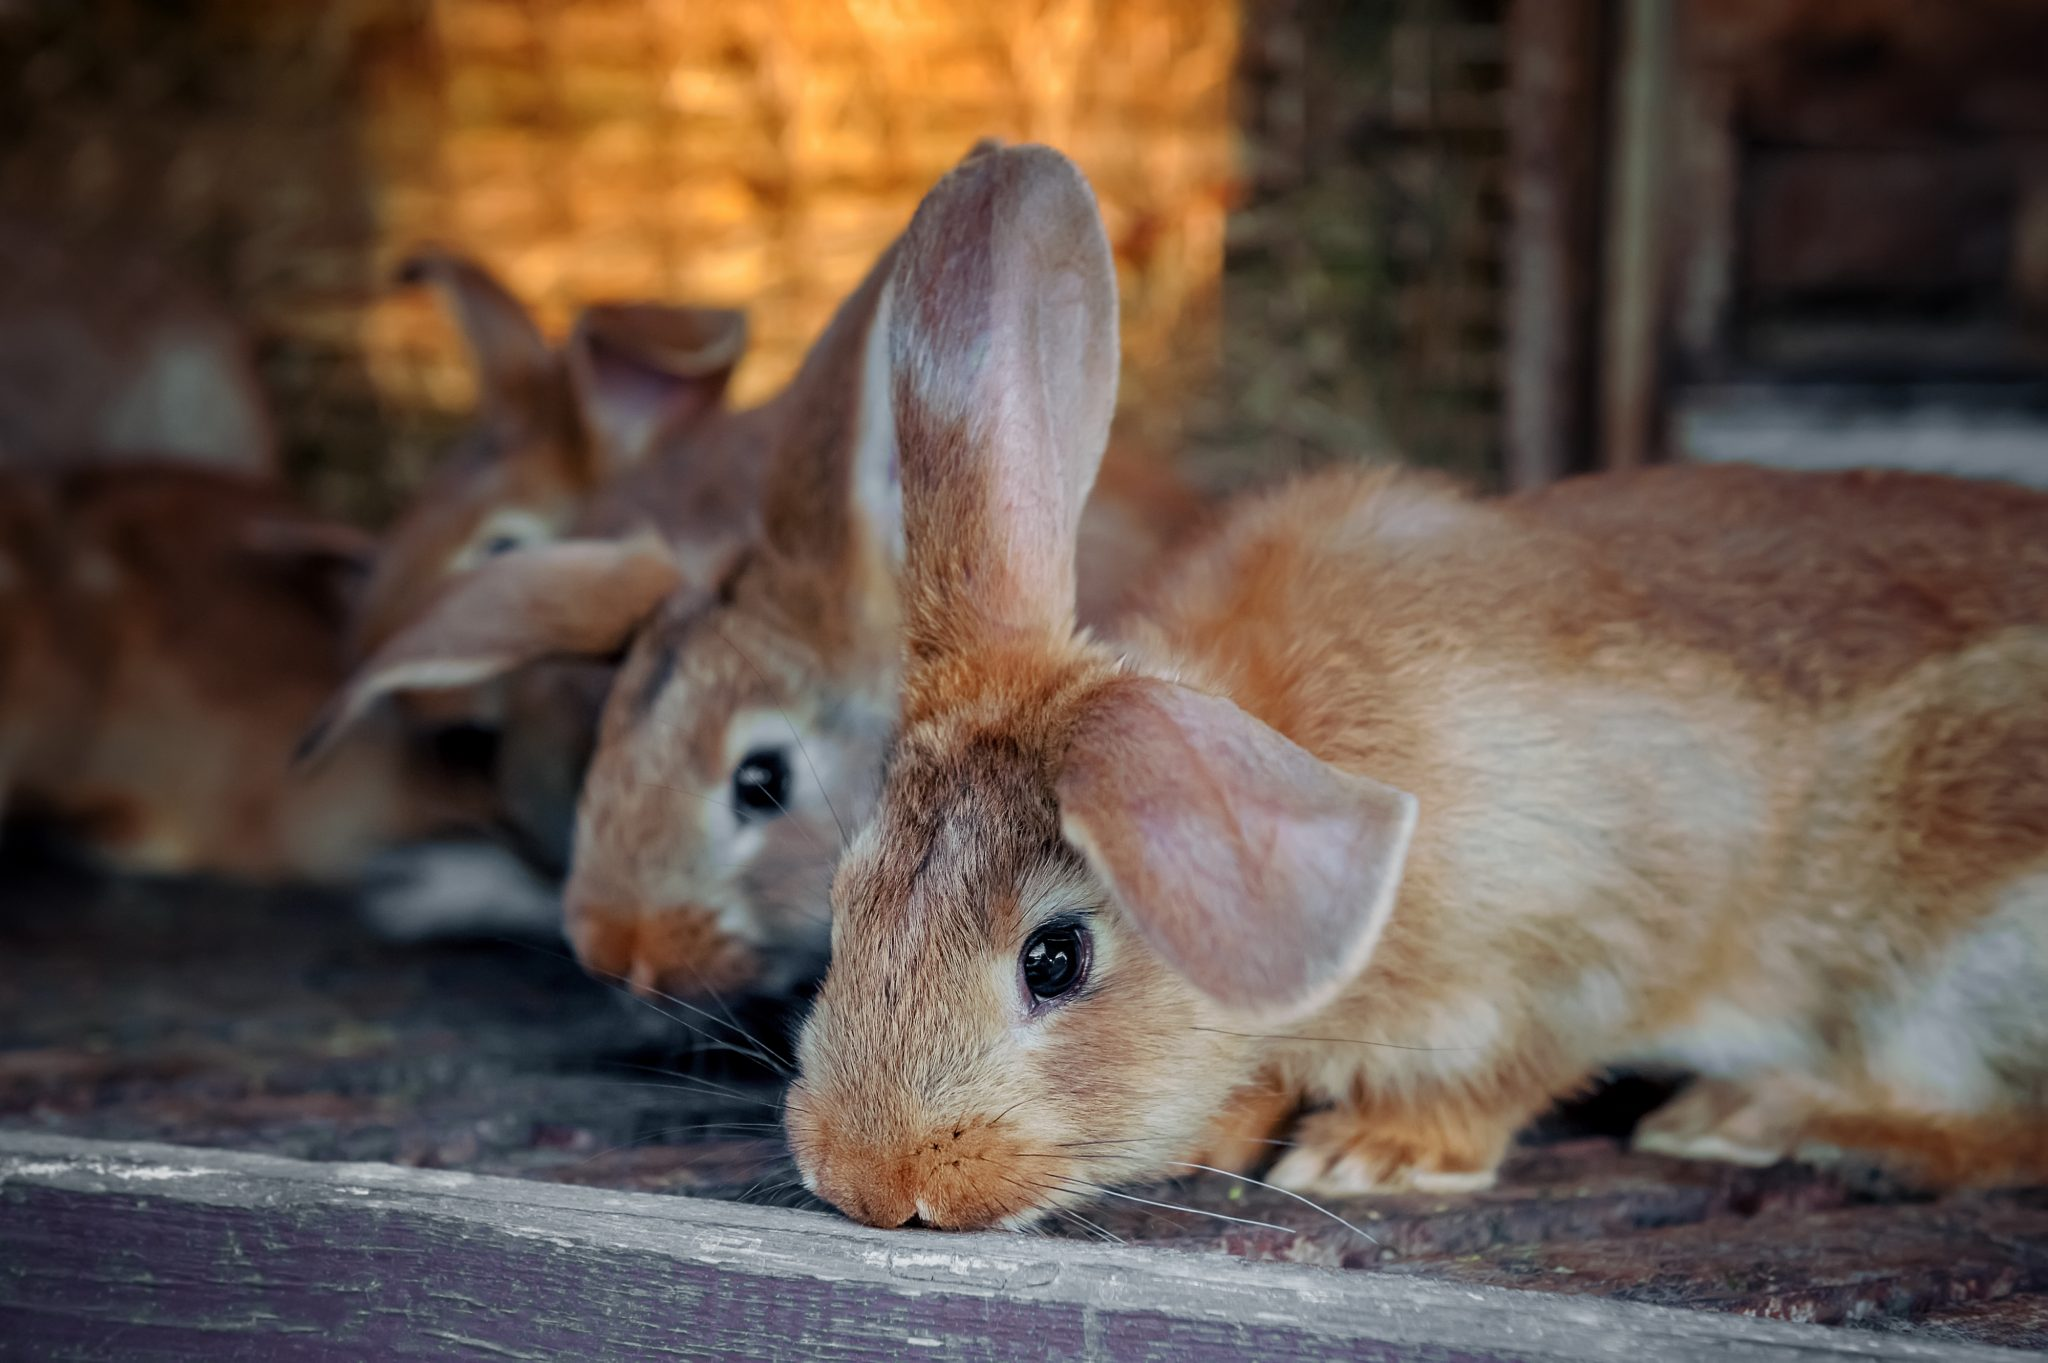 Rabbits on rabbit farm